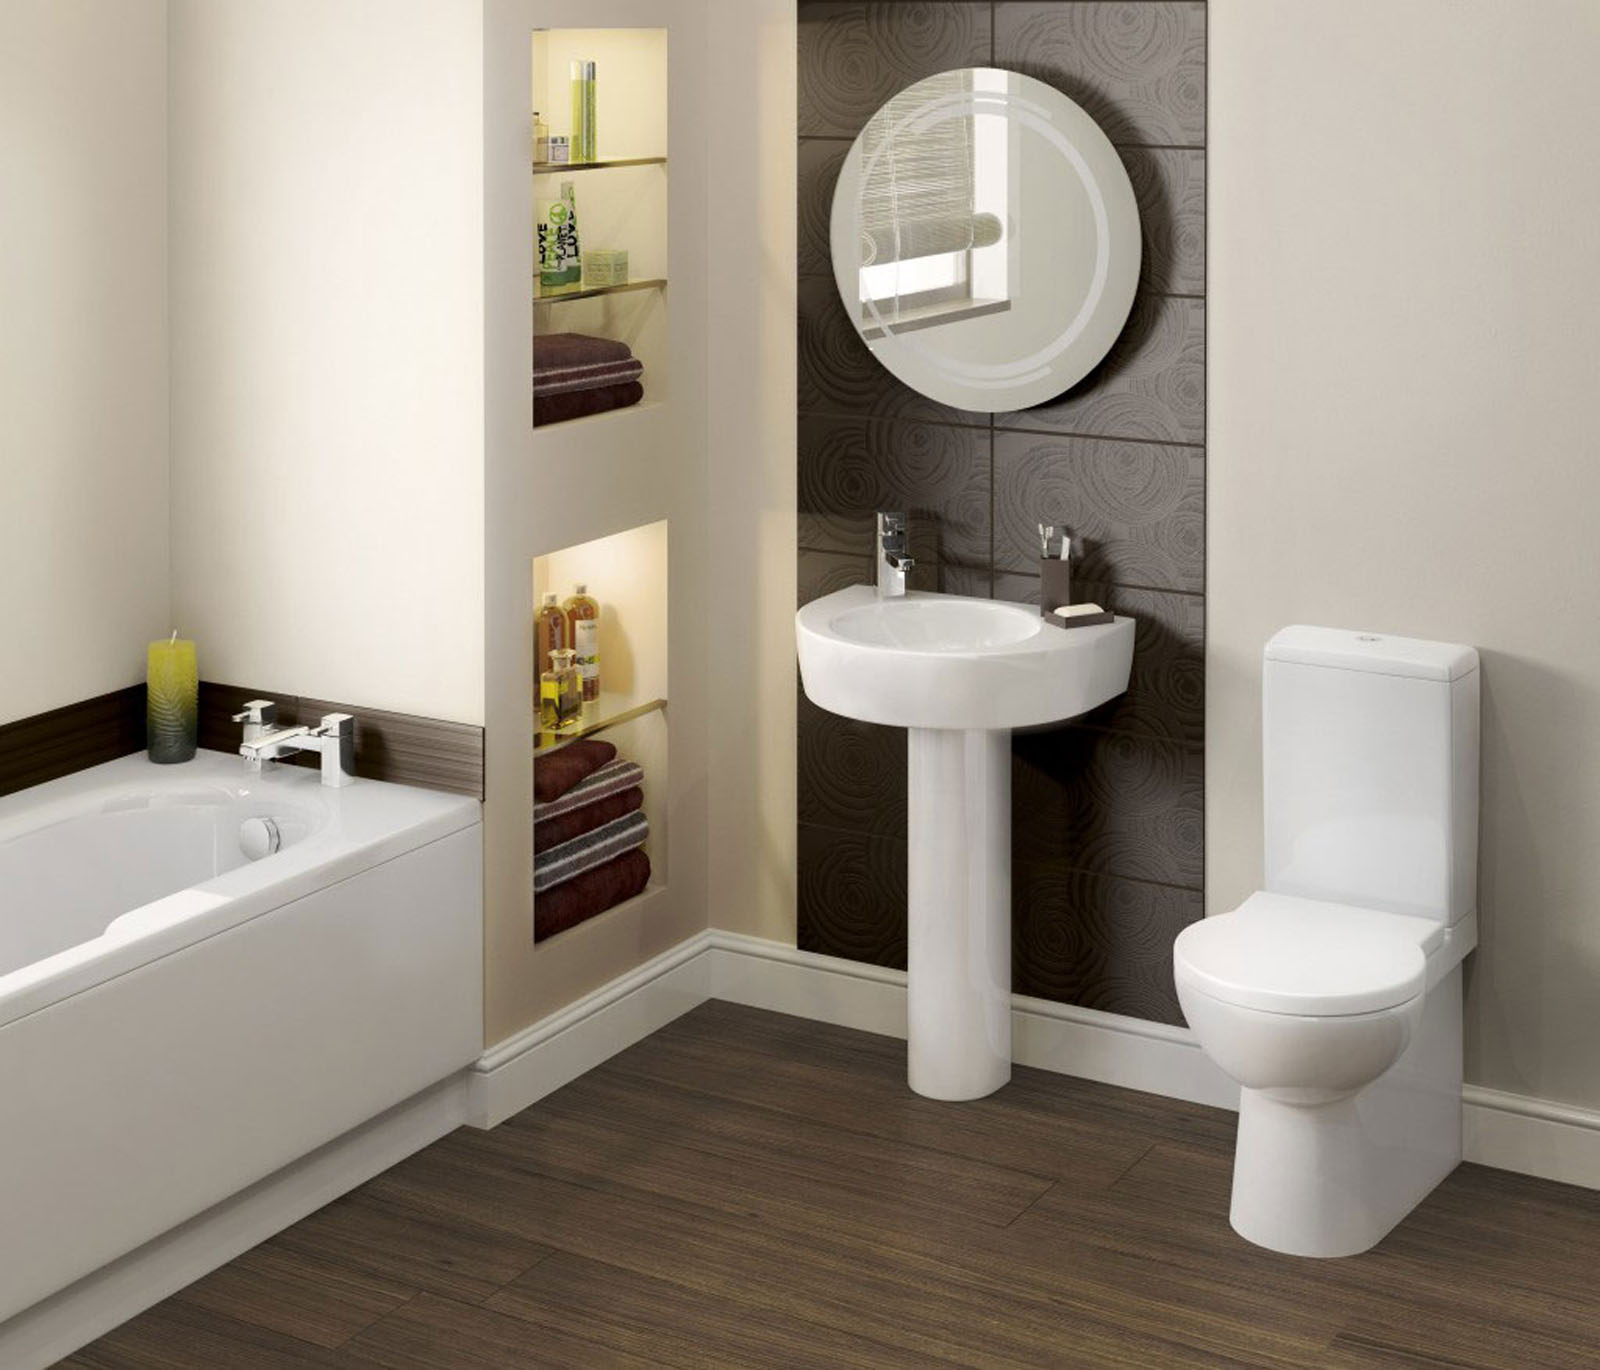 spa bathroom storage photo - 3